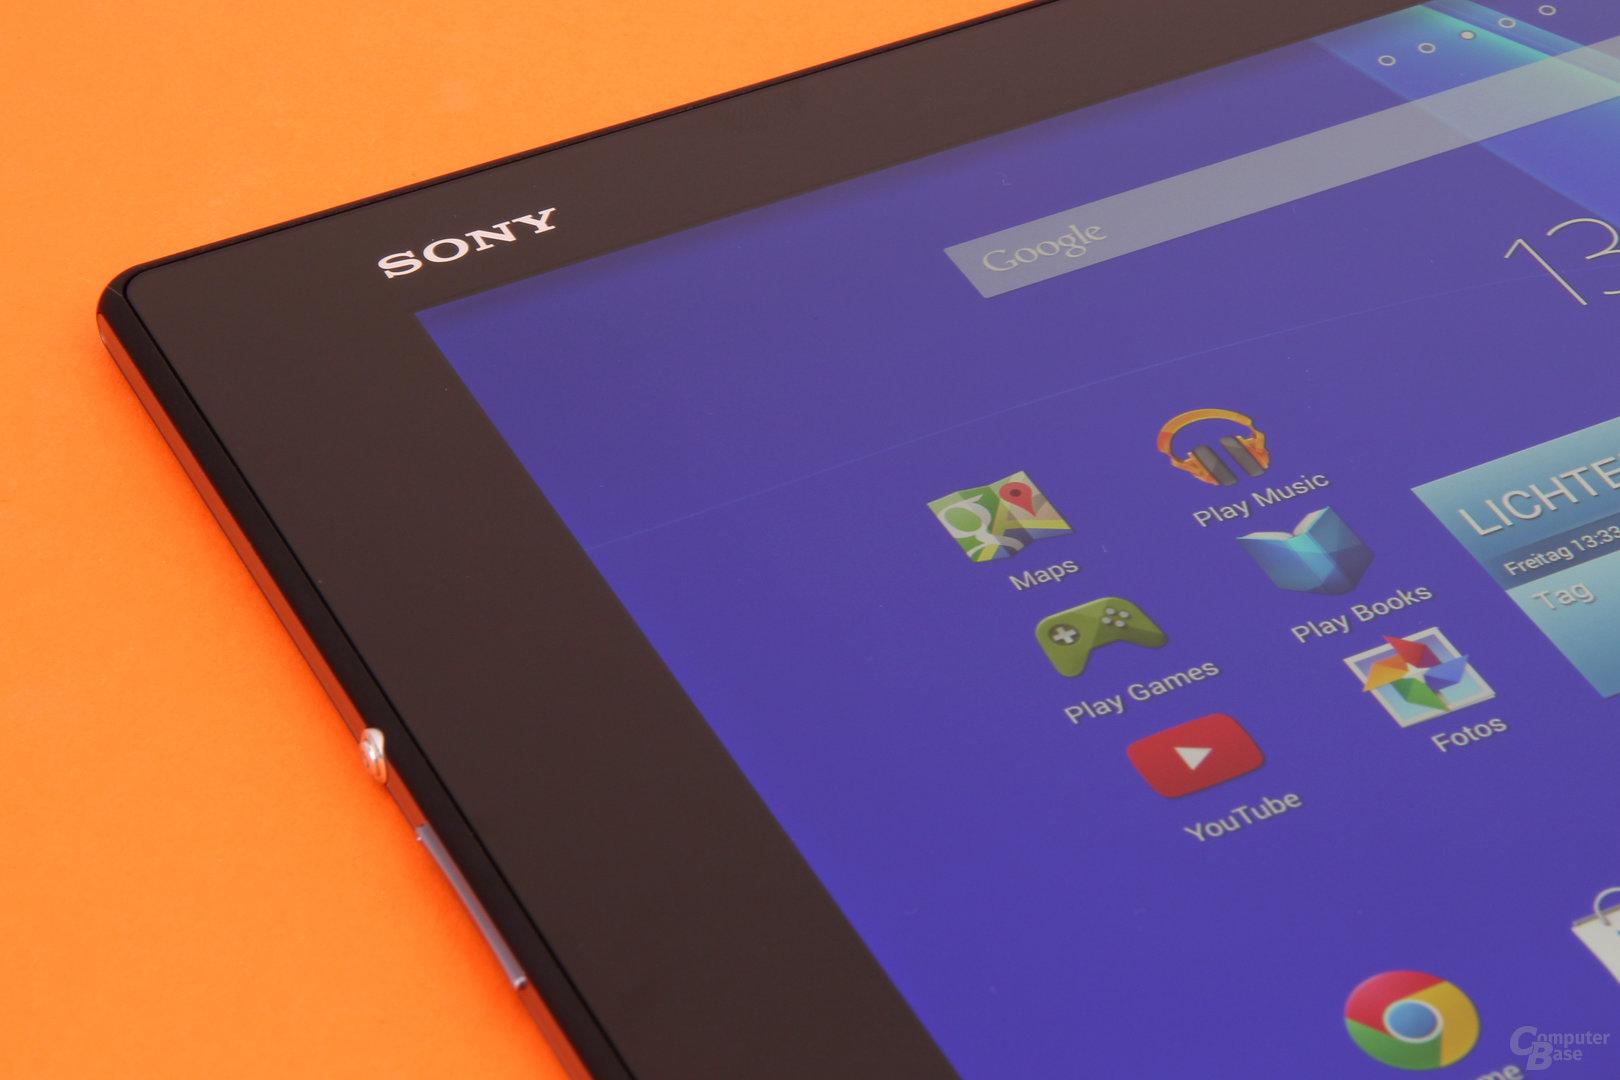 Das Display des Sony Xperia Z2 Tablet